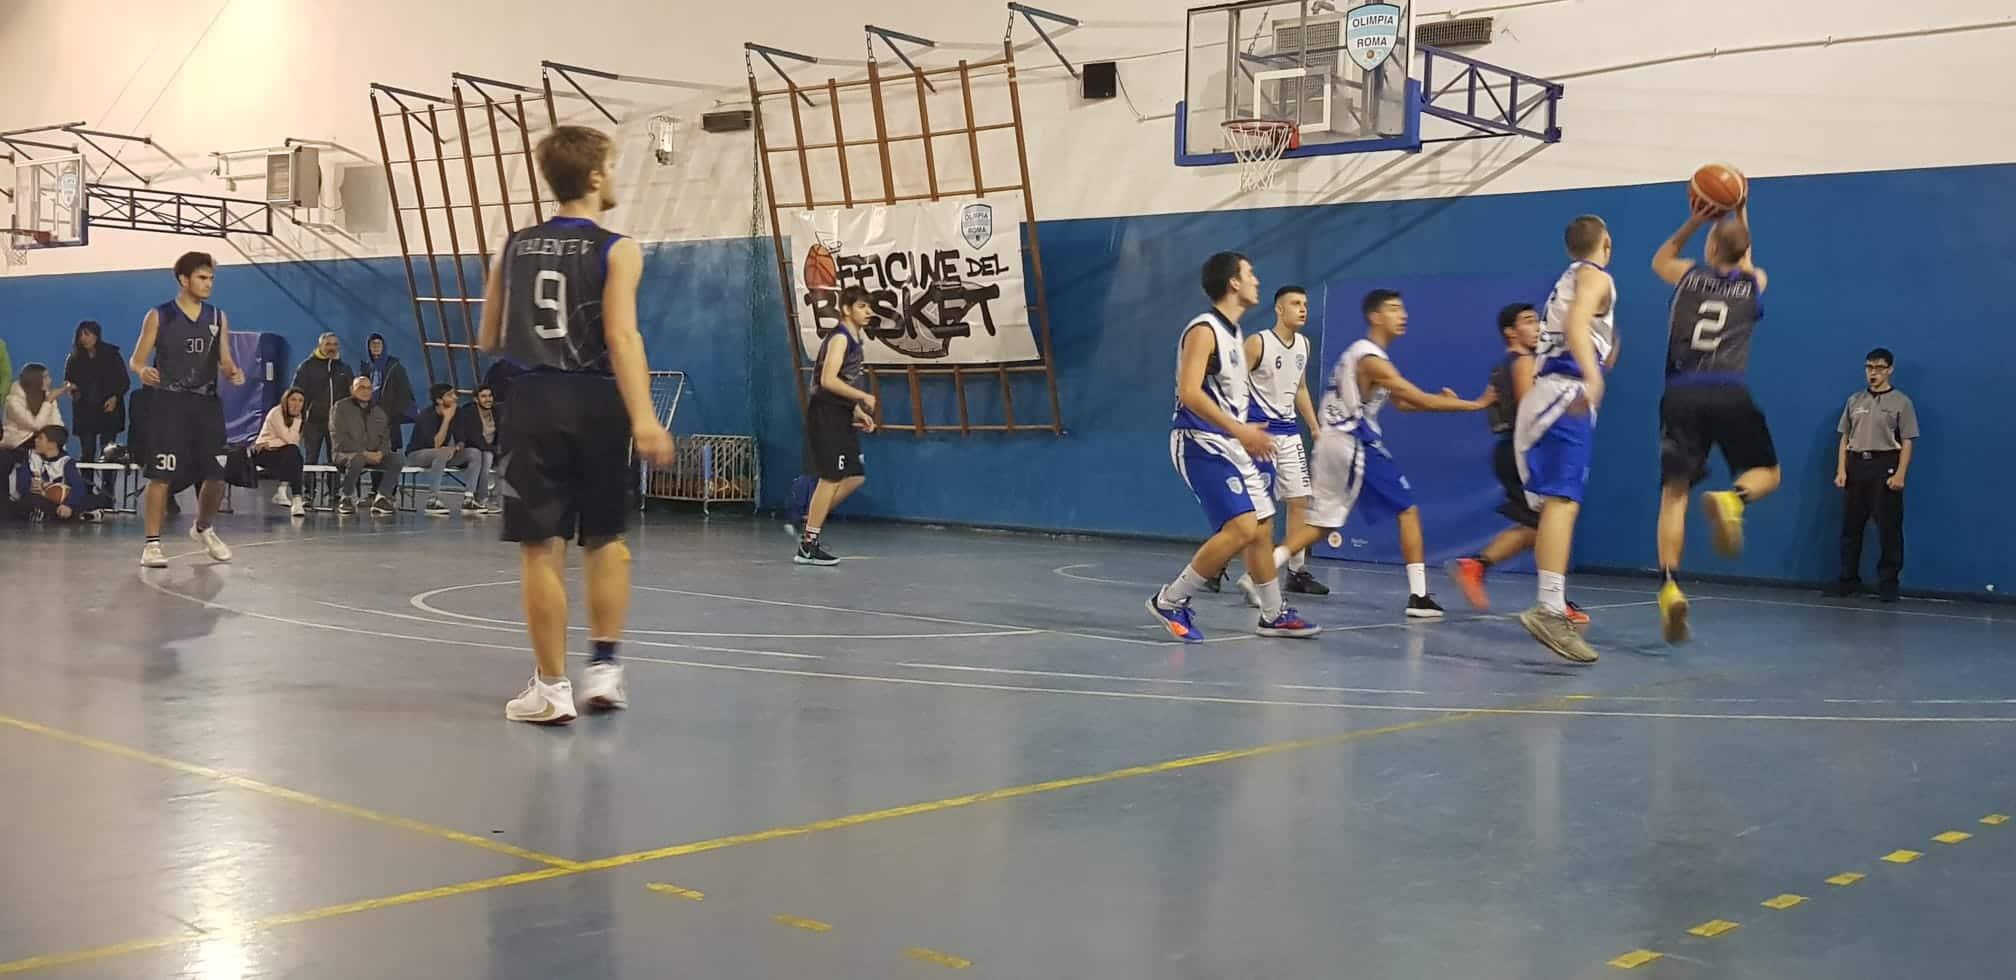 Olimpia roma e Basket Polaris in campo